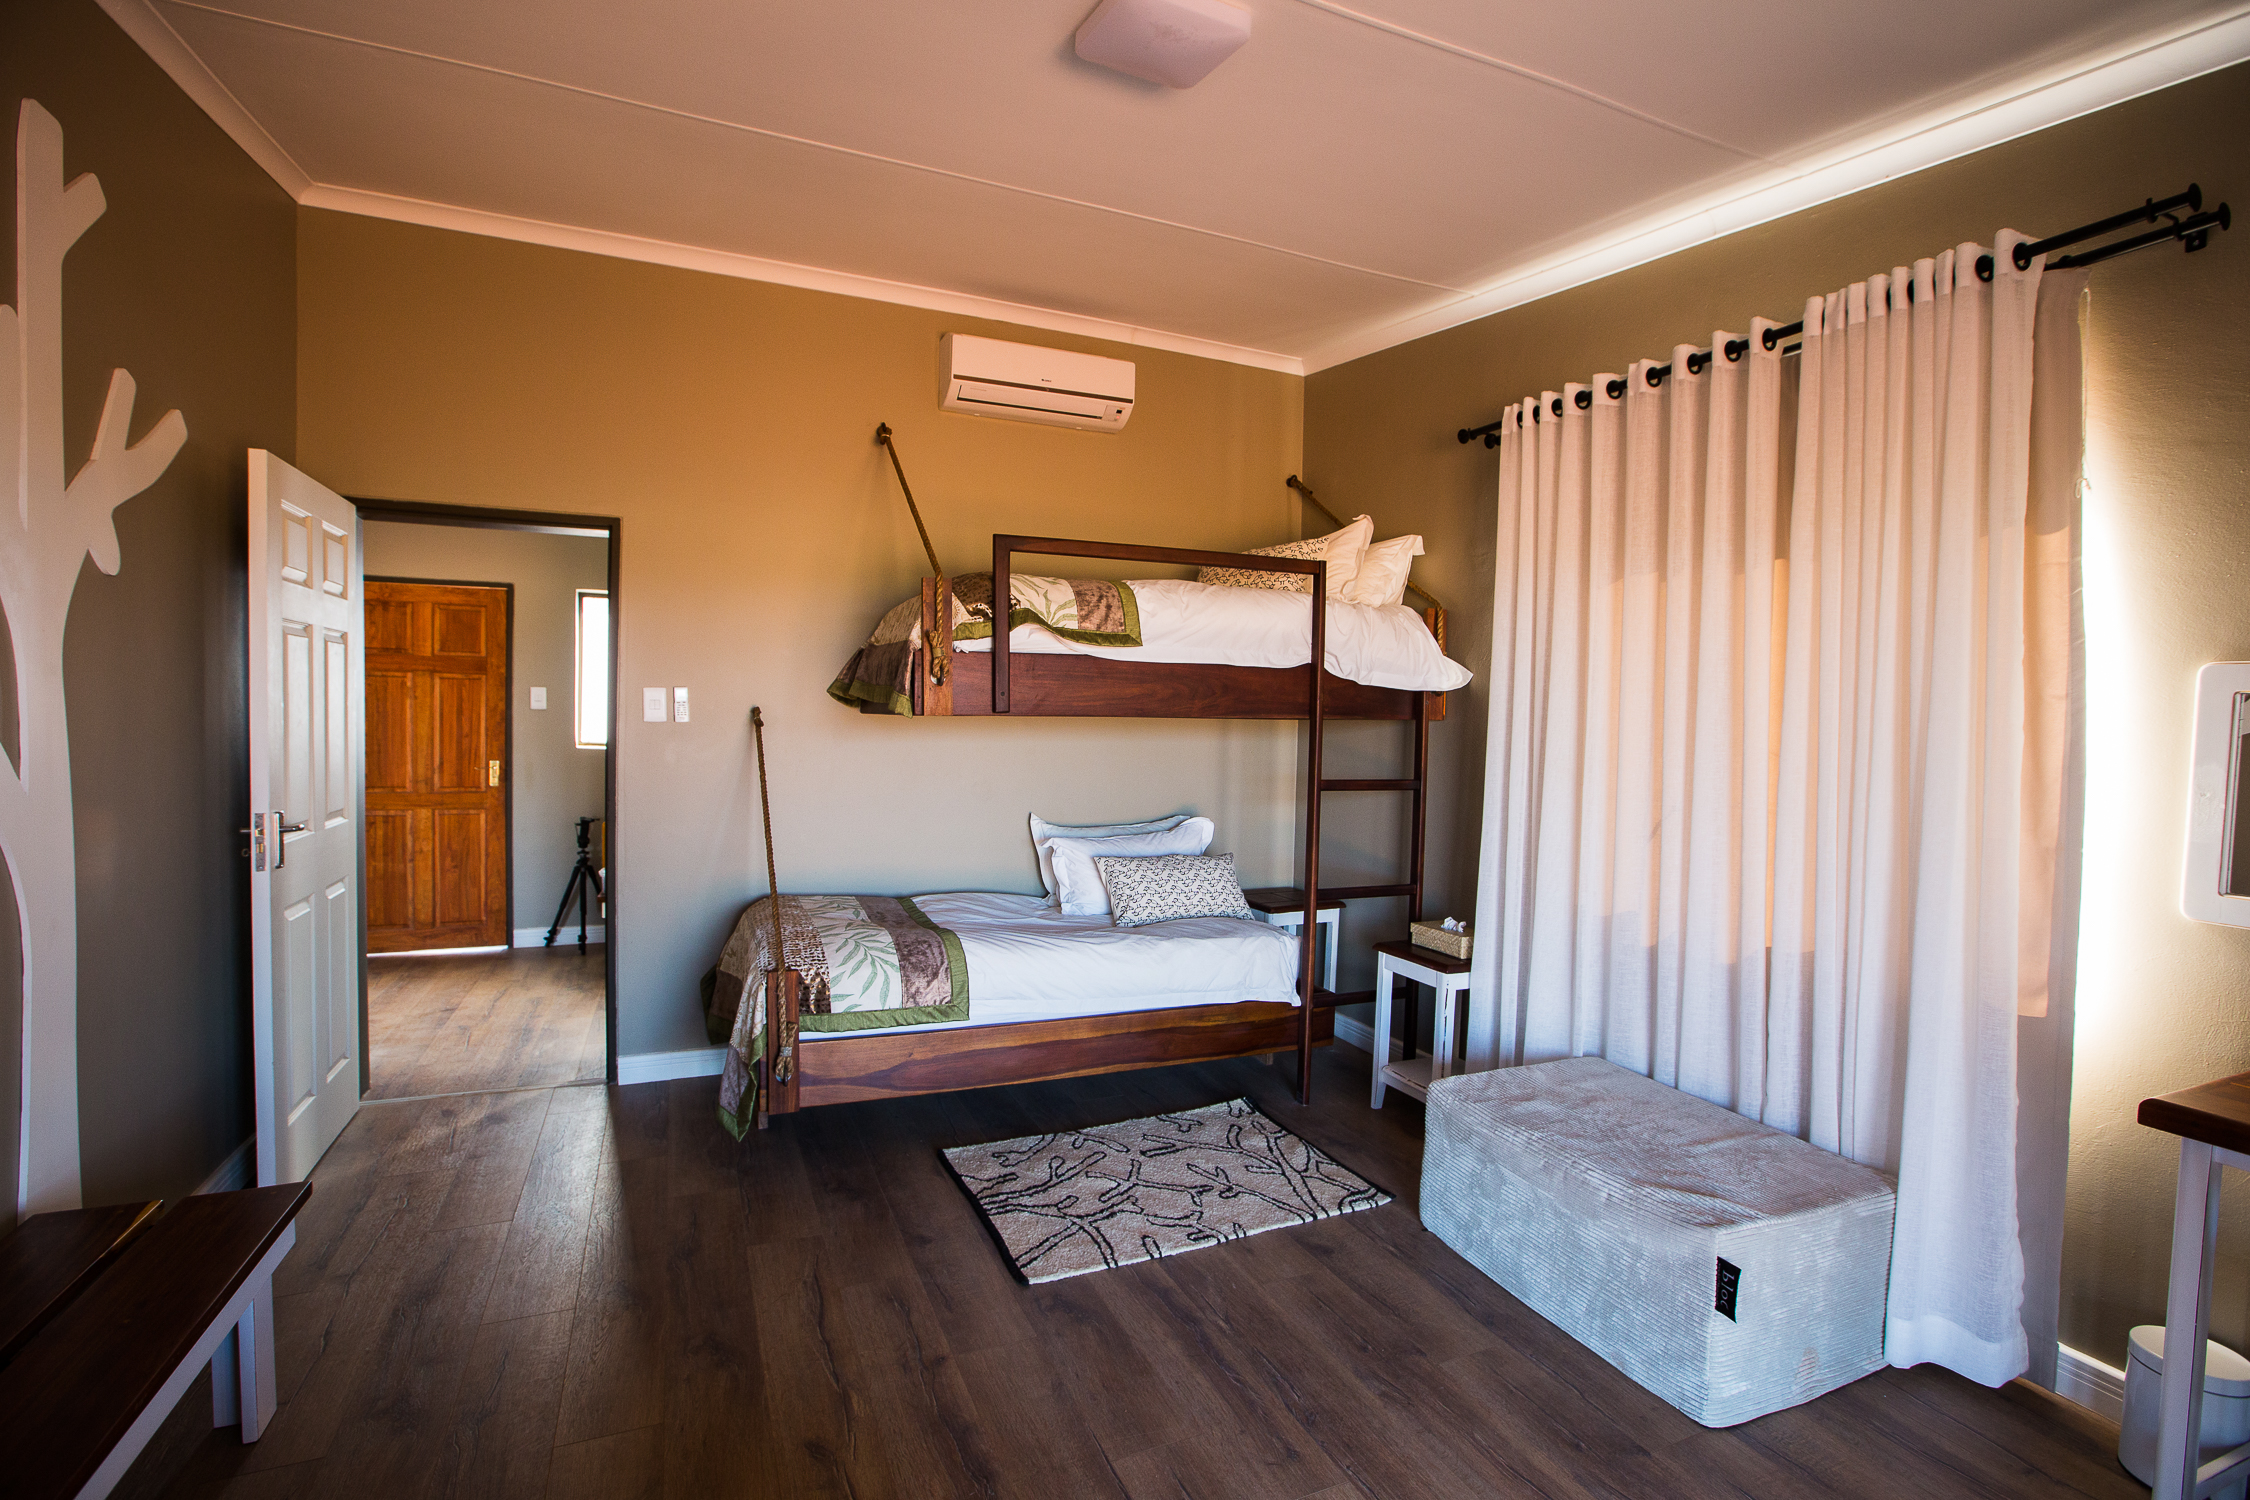 Kalahari Ohio Hotel Rooms